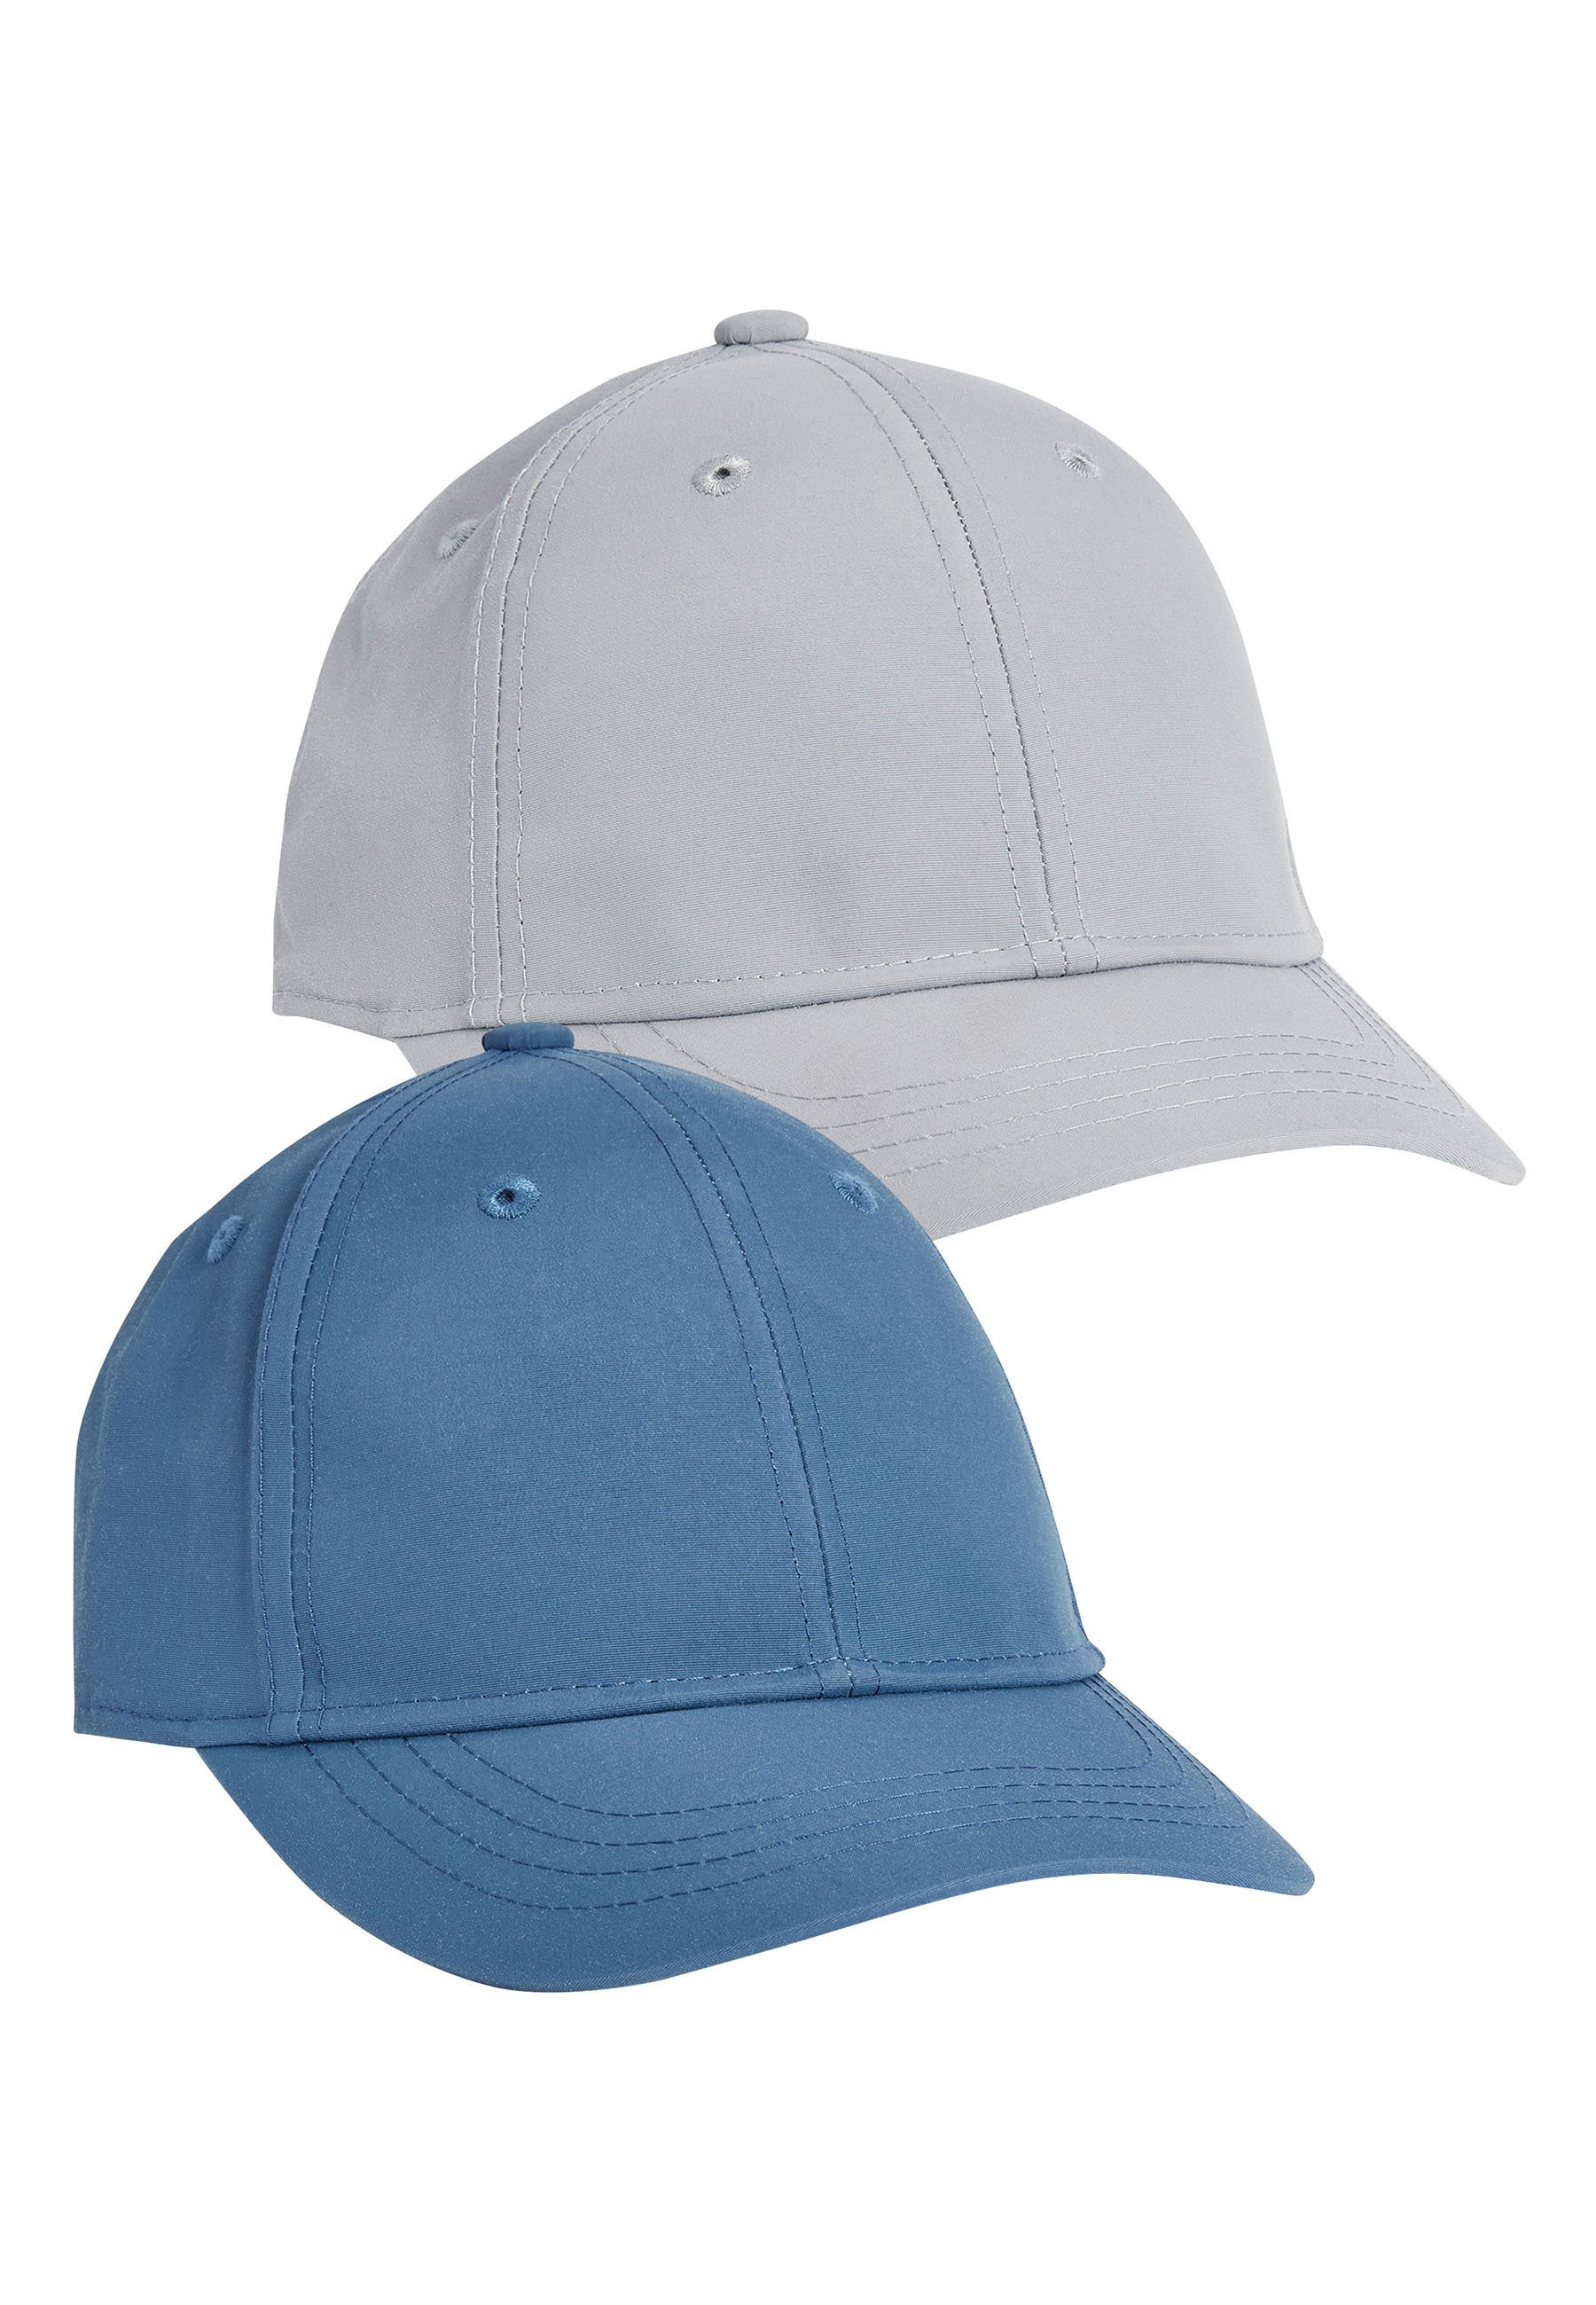 Kinder 2 PACK CAPS - Cap